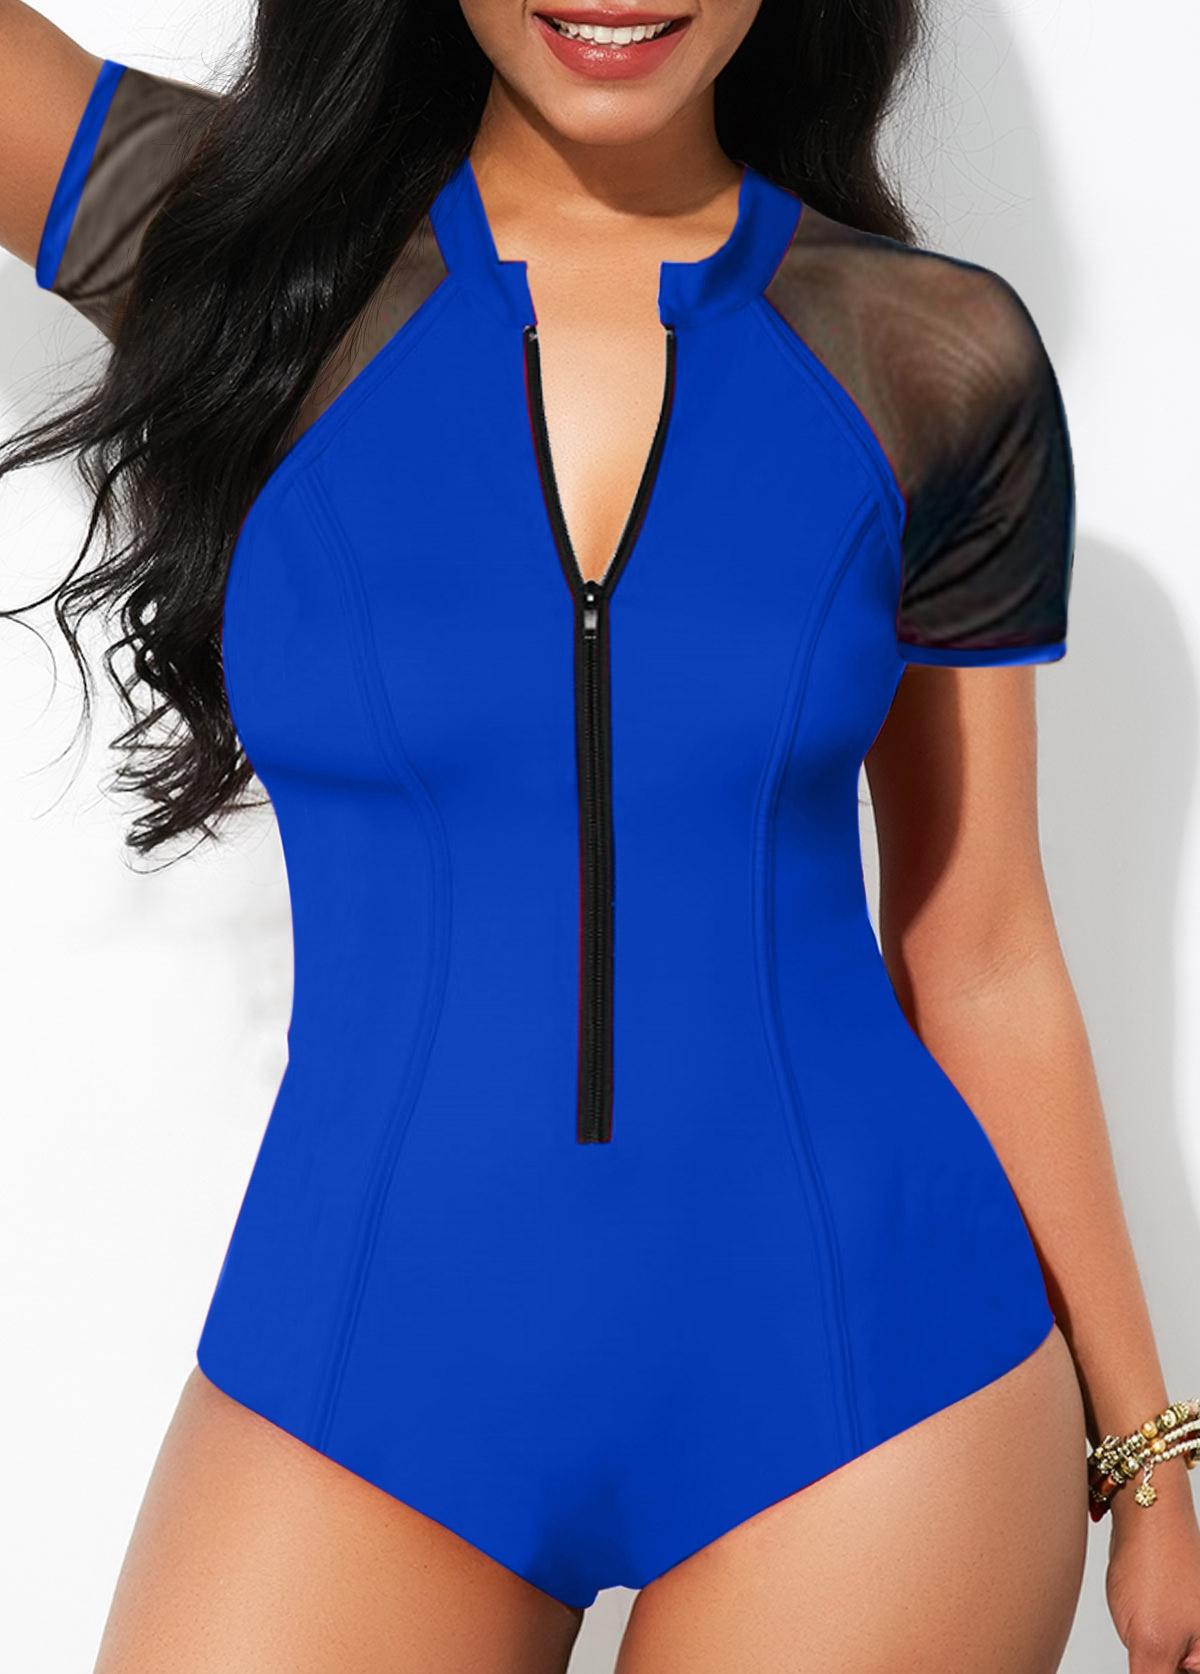 2067d3b9757 Zipper Front Cutout Back One Piece Swimwear   Rosewe.com - USD $28.34